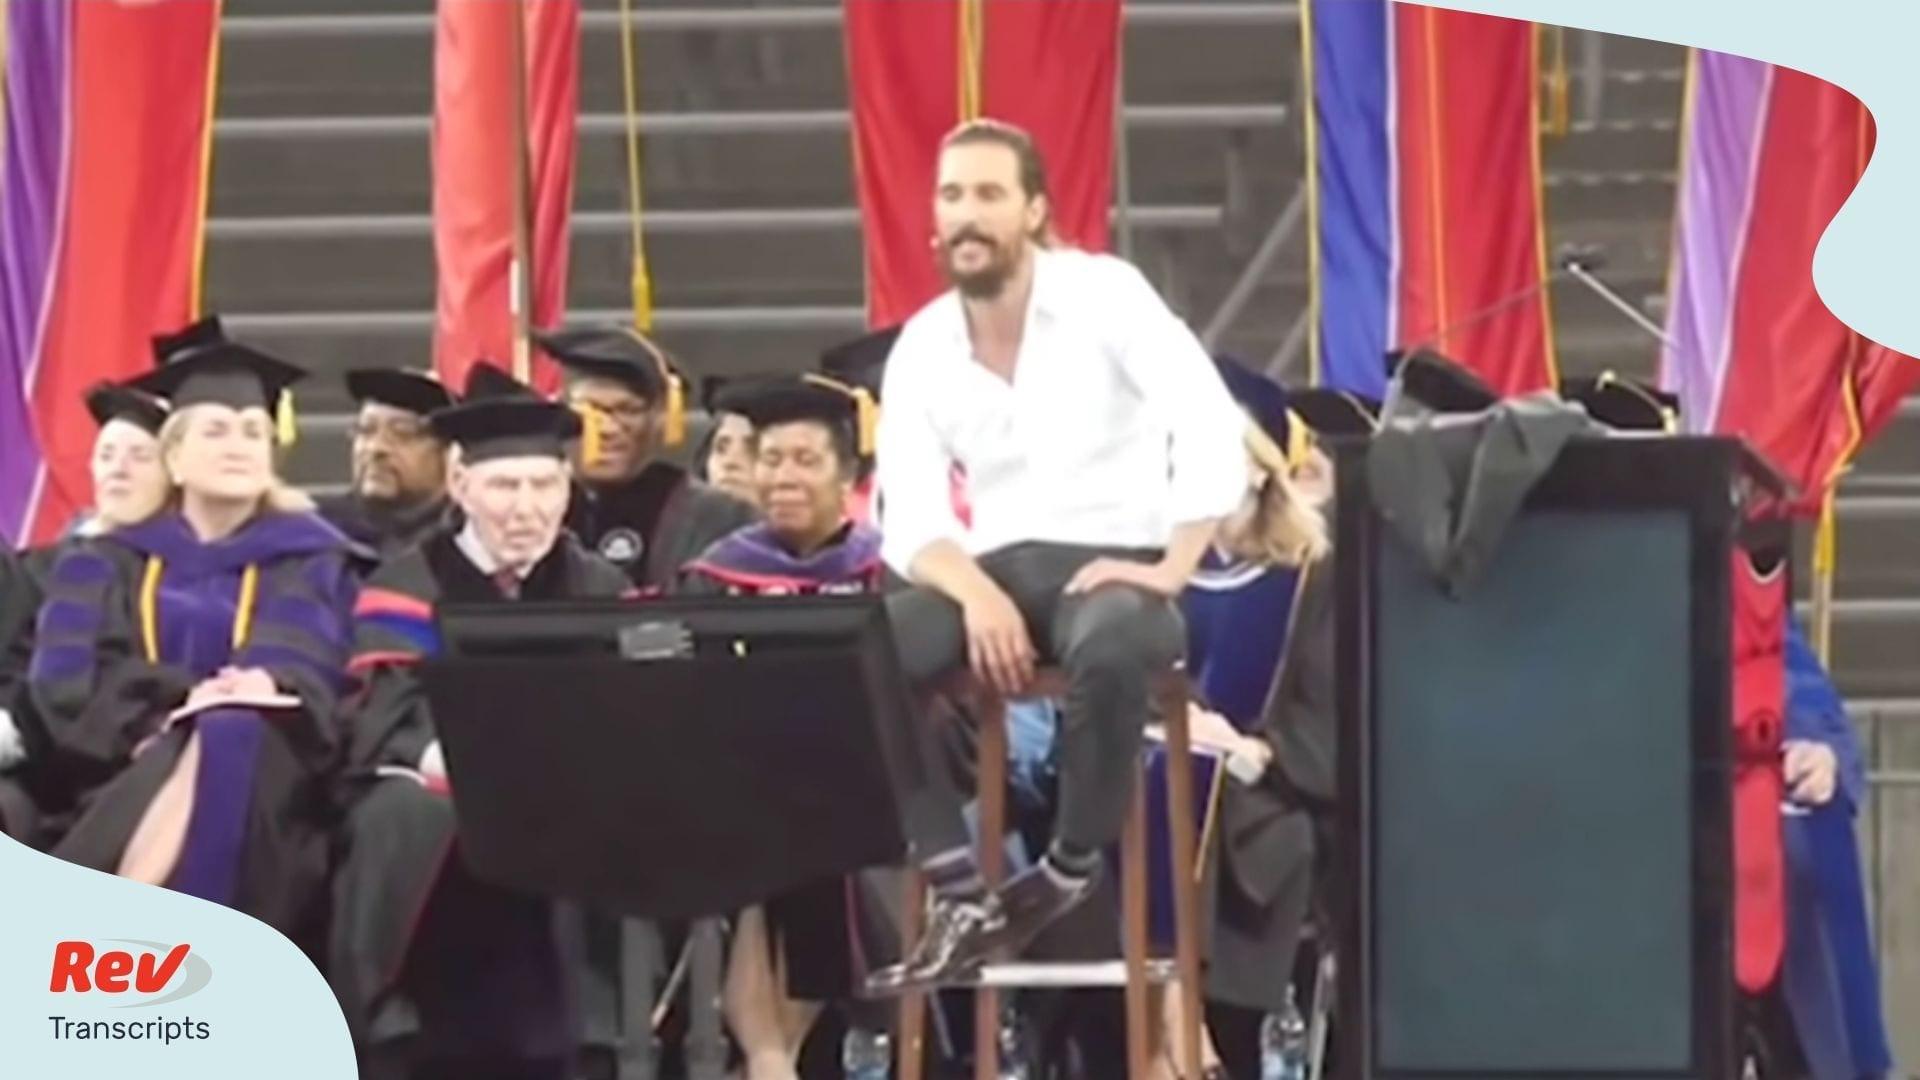 Matthew McConaughey Motivational Speech Transcript